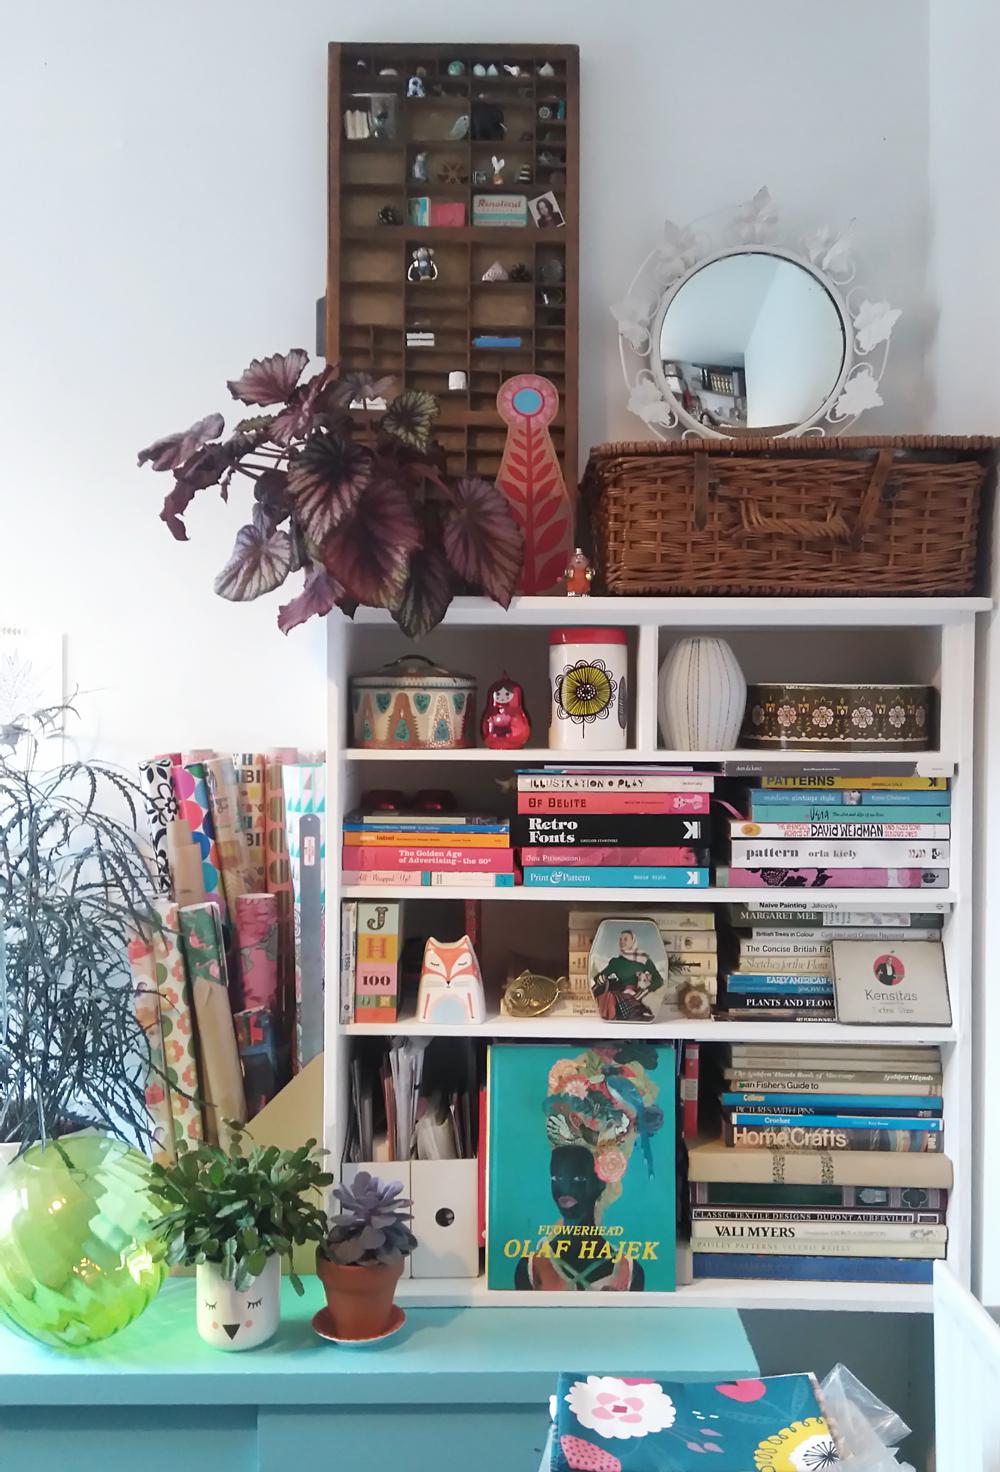 maggie magoo notebook, MaggieMagoo Designs, Maggie Magoo, British designer, meet the maker interview, print and pattern,